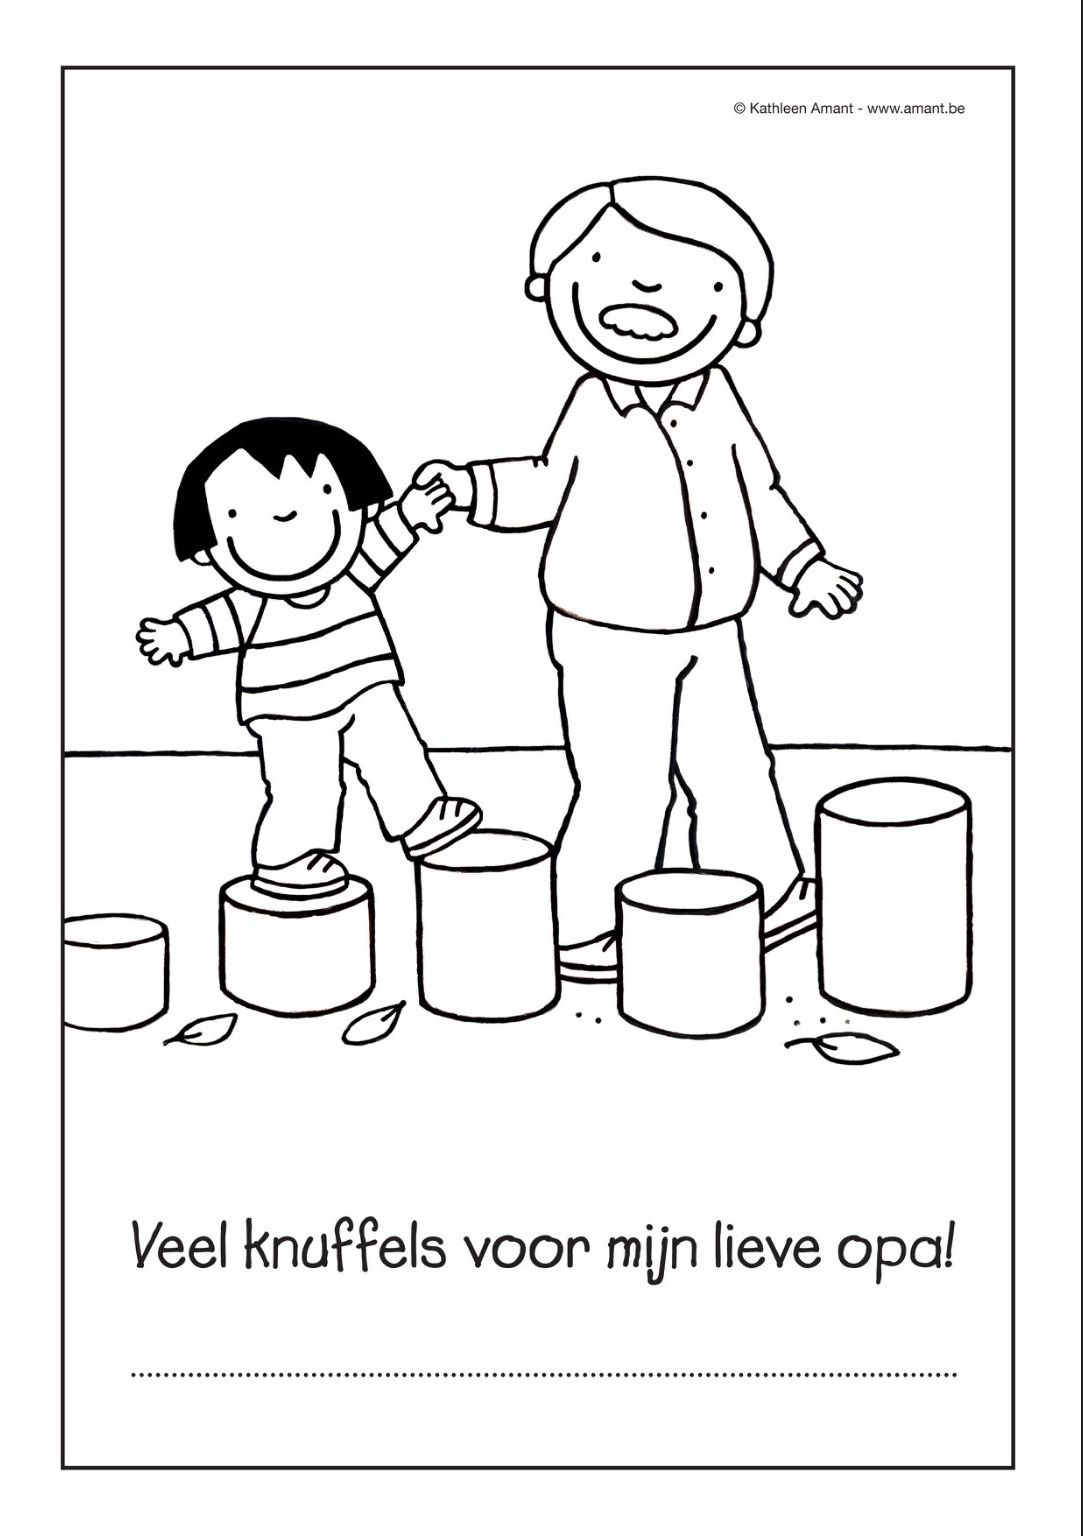 Pin Van Heidi Op Anna Heksje Mimi Kaatje Grootouders Anna Kleine Kinderen